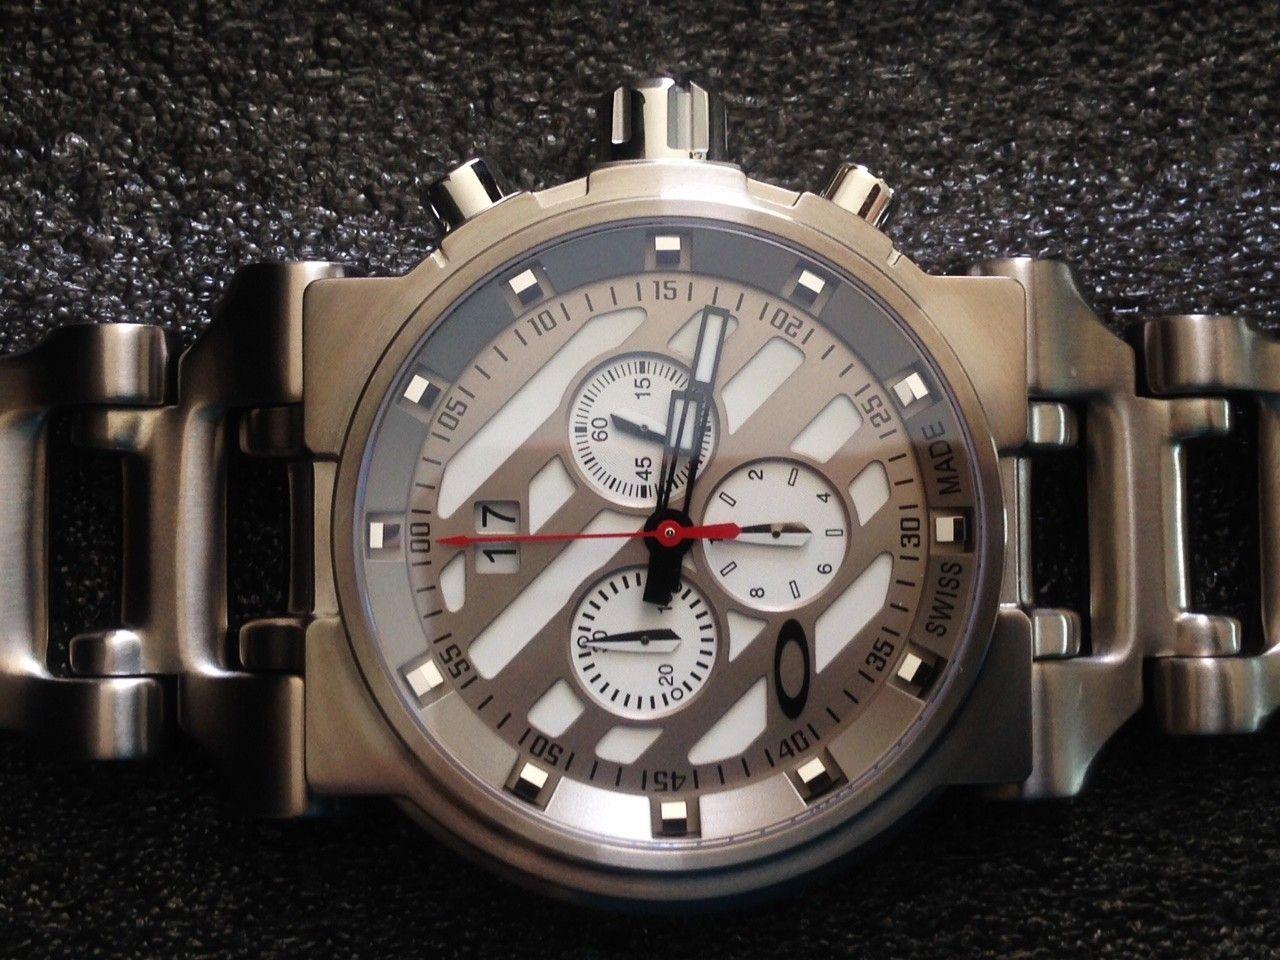 NEW IN BOX Oakley Hollow Point Titanium Watch White Dial 10-046 - 3.JPG